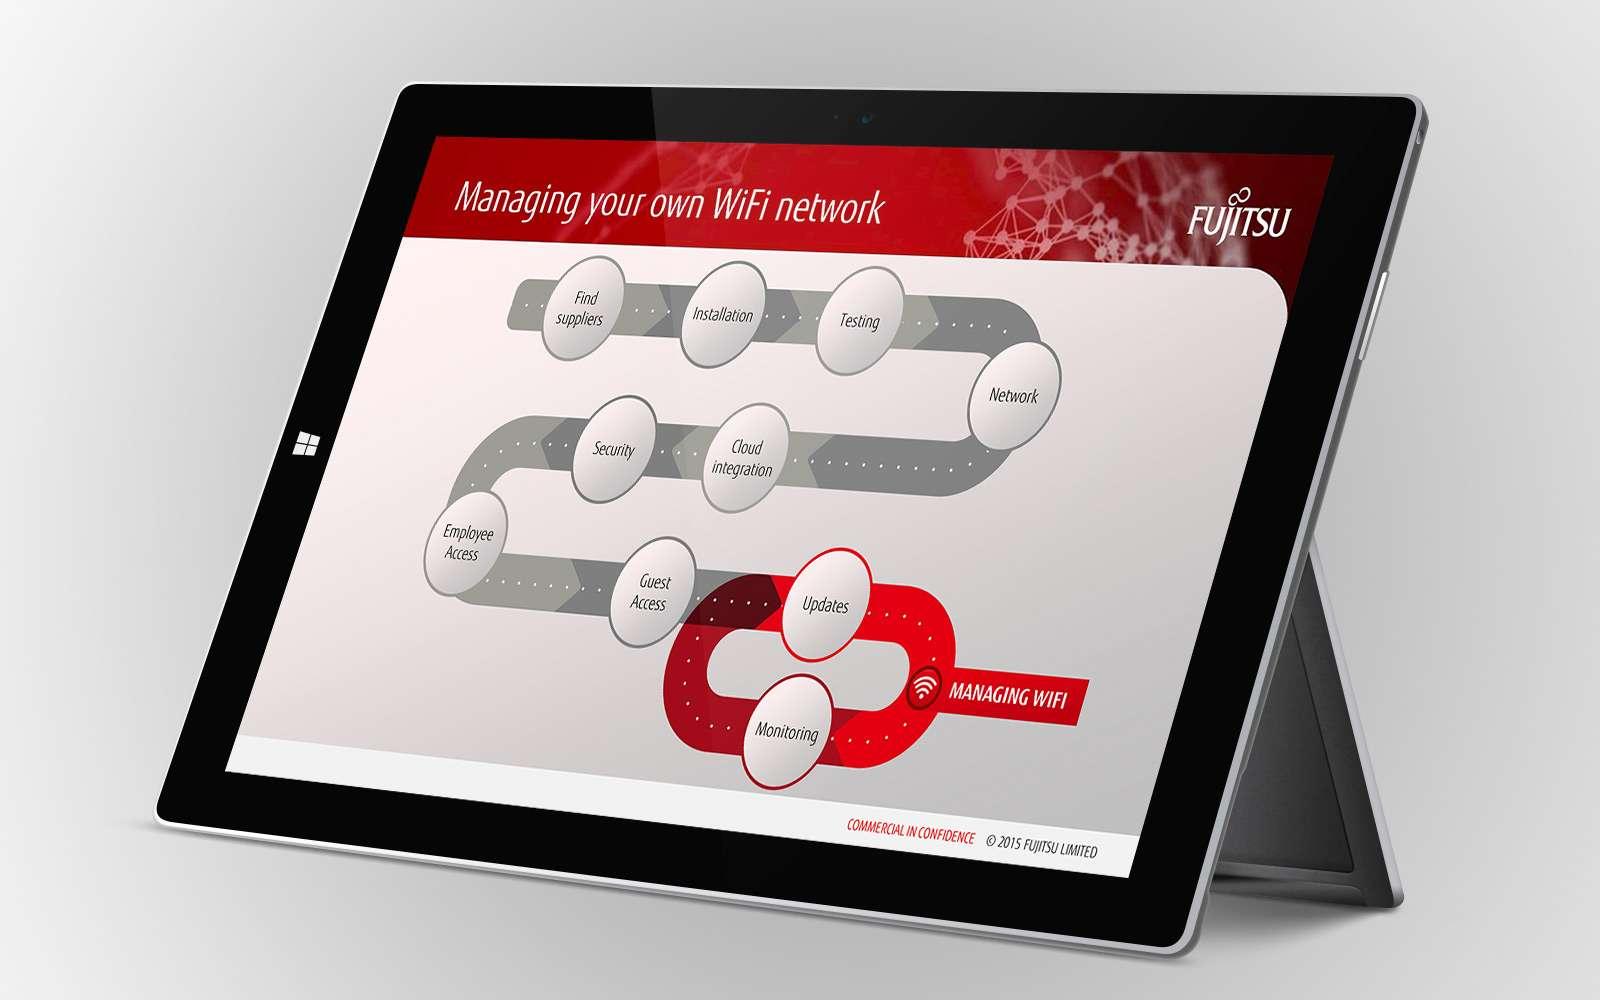 Black iPad displaying Fujitsu interactive touchscreen sales enablement tool